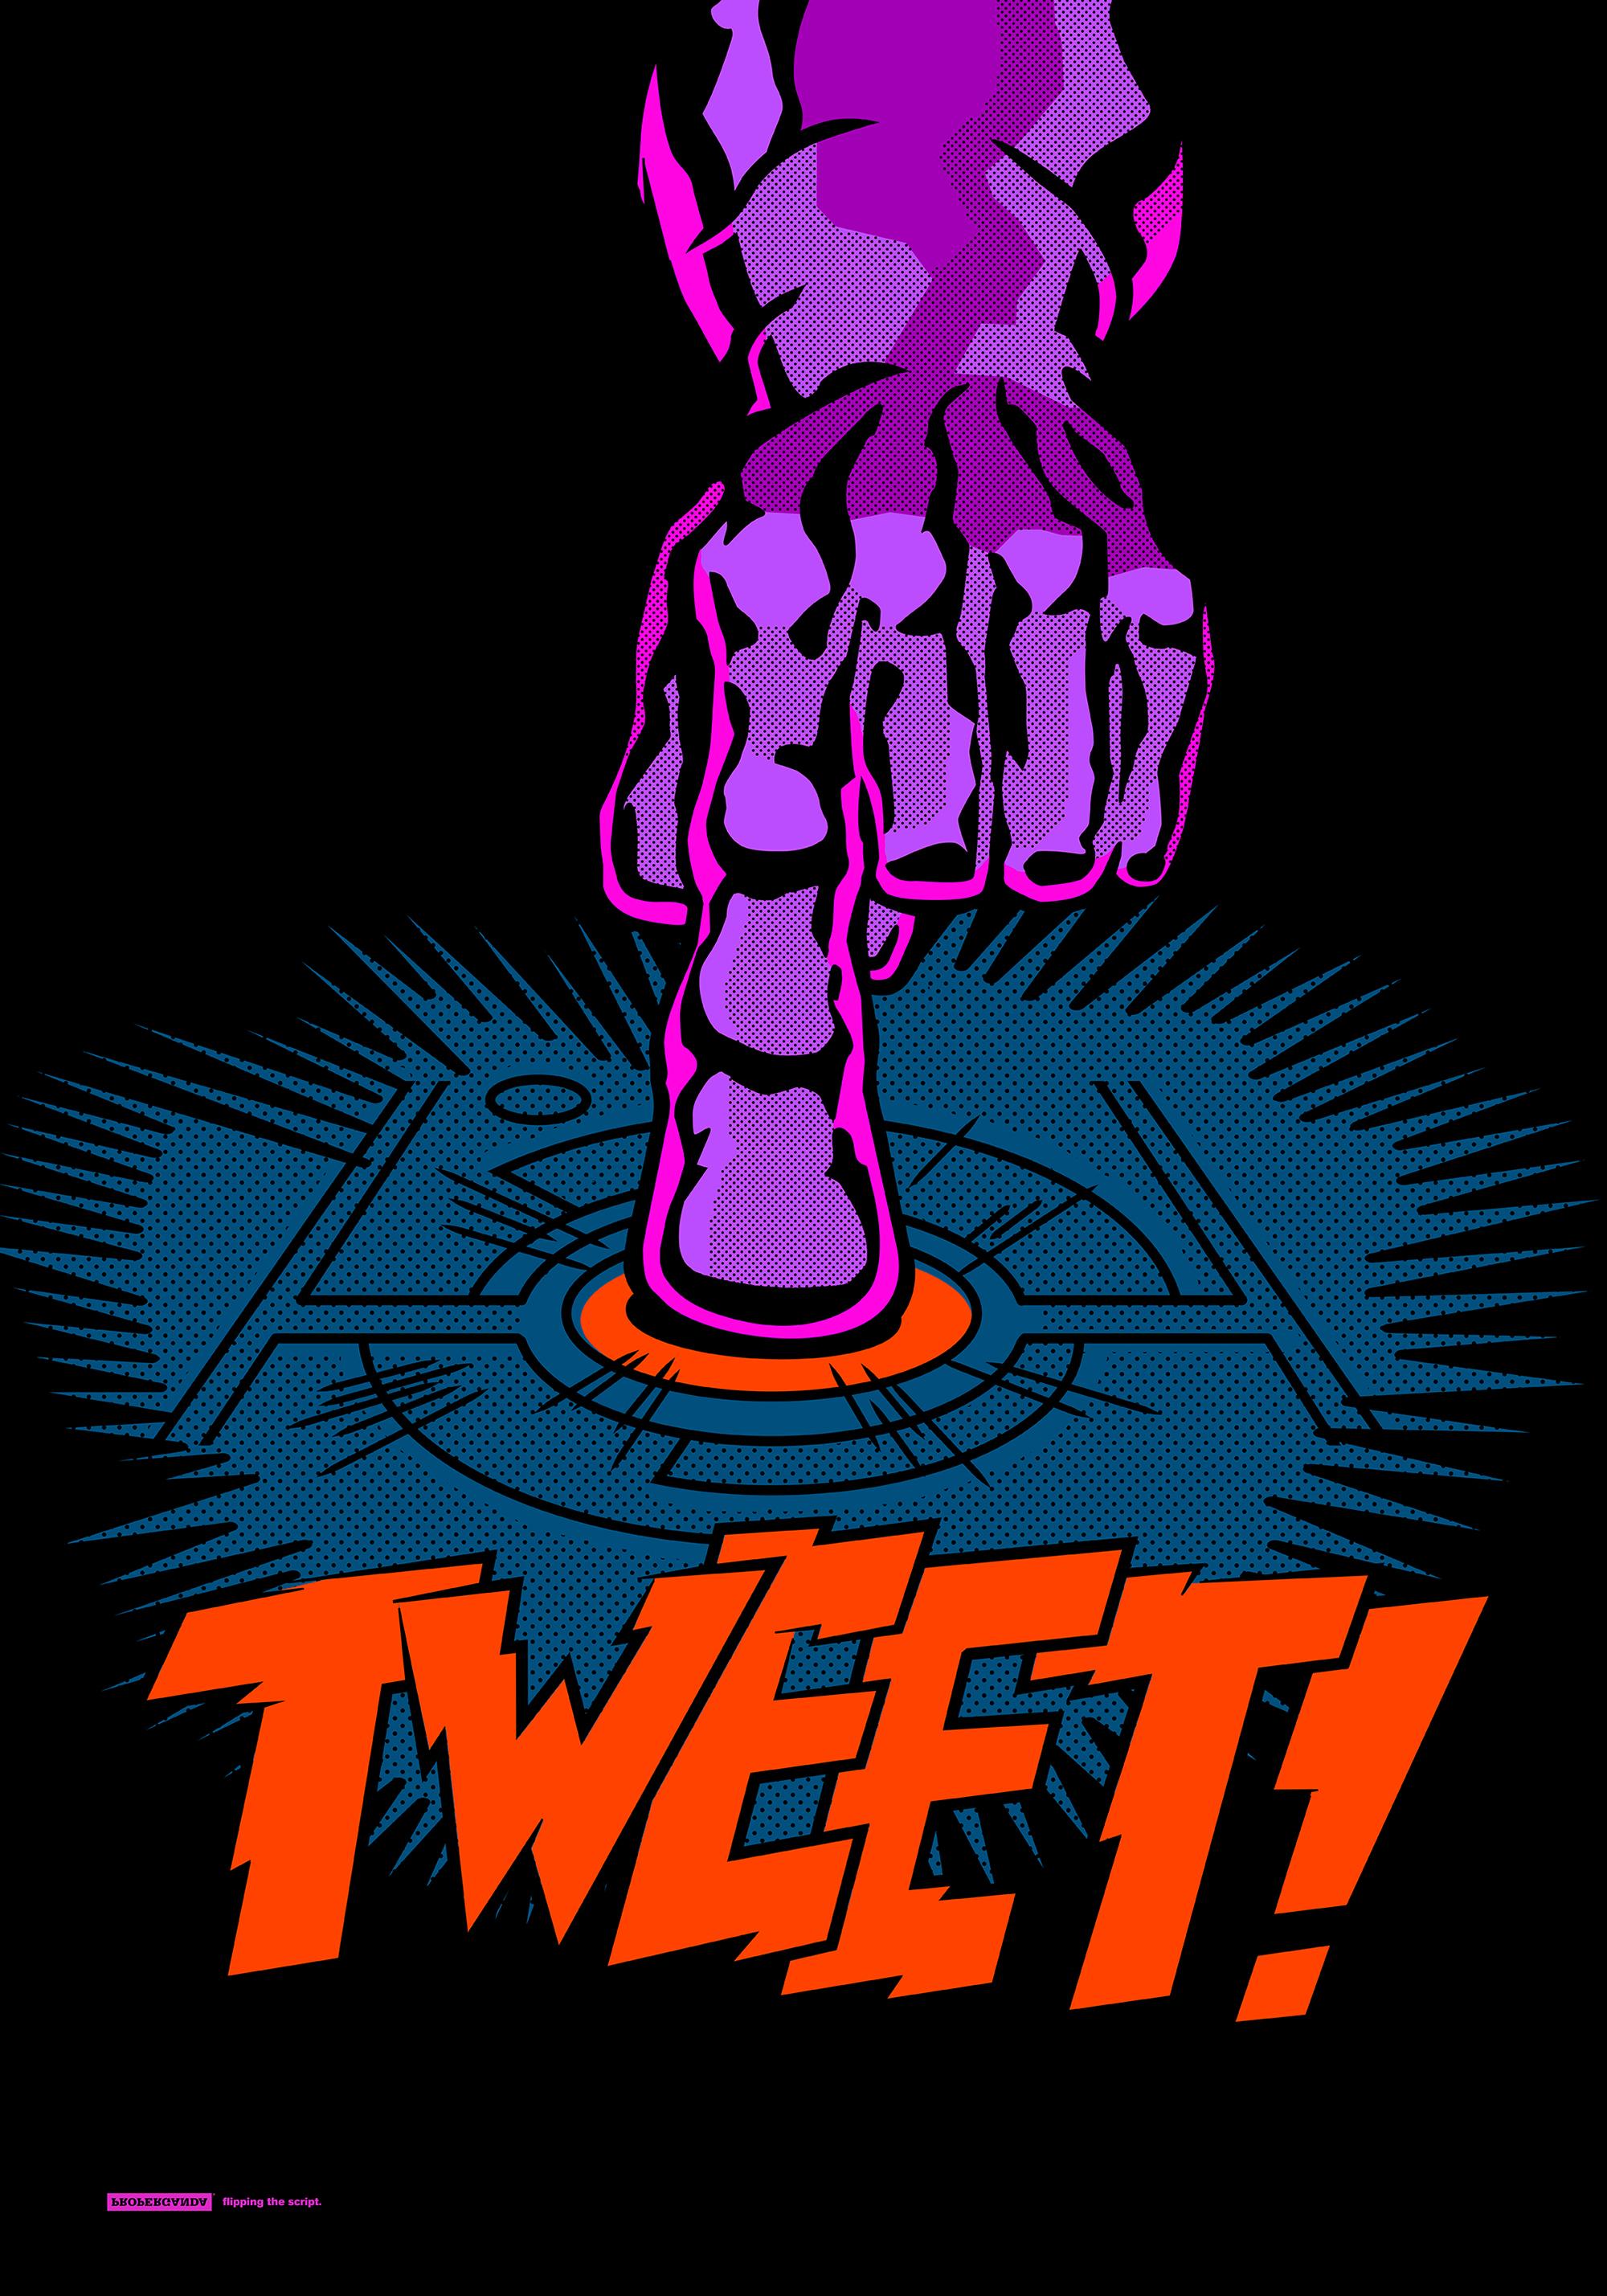 Comic_Twitter_Small.jpg